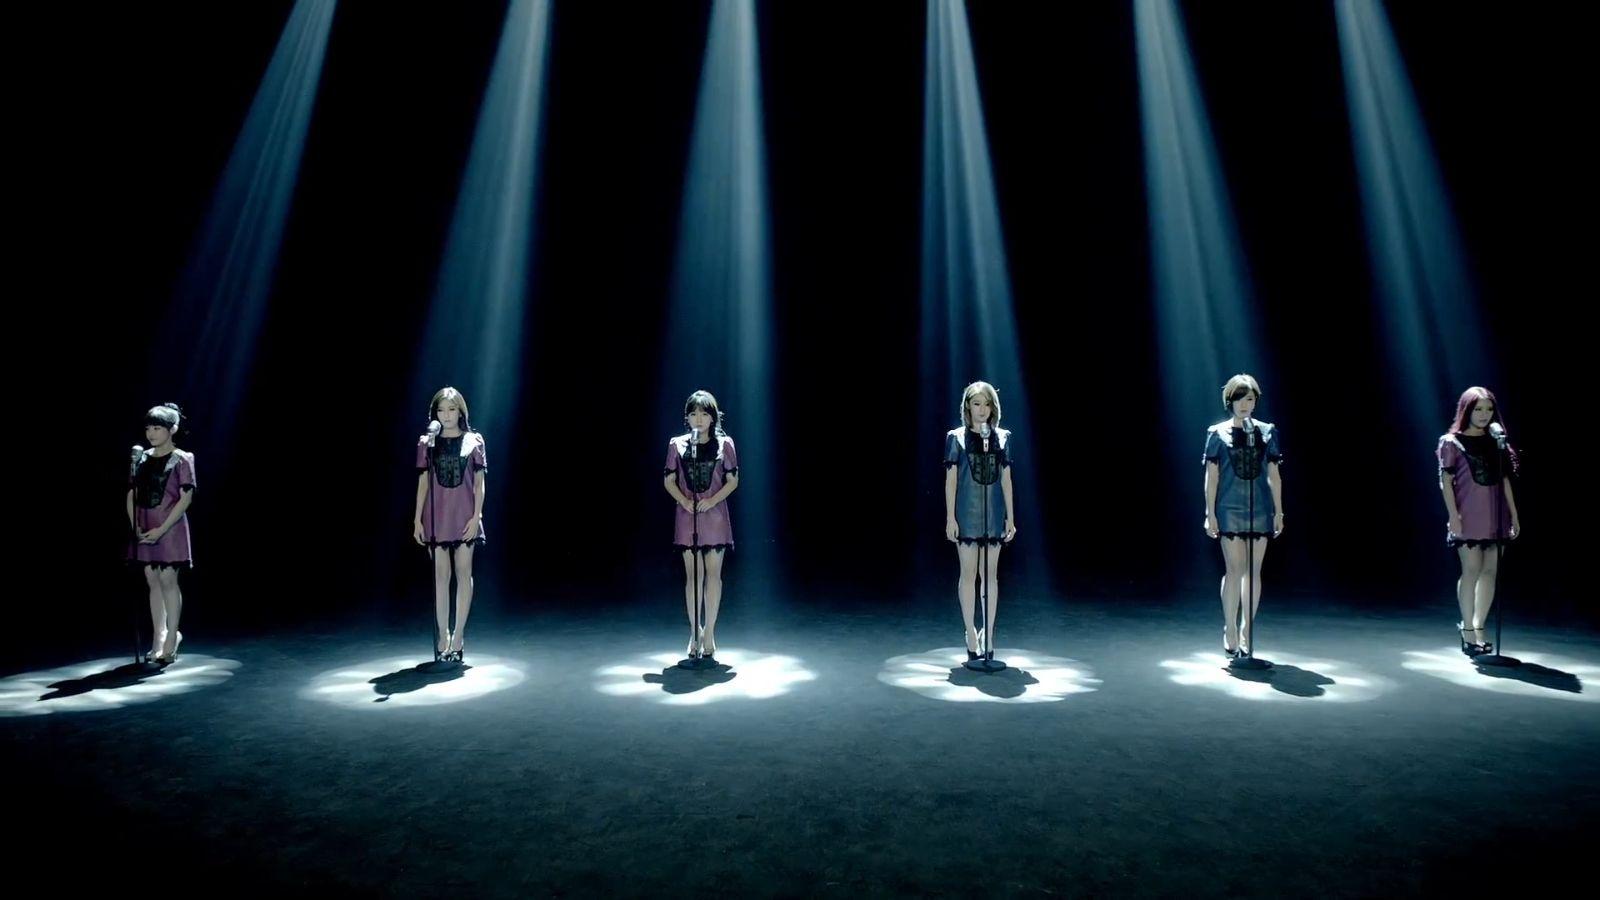 _t=t_t-ara新歌